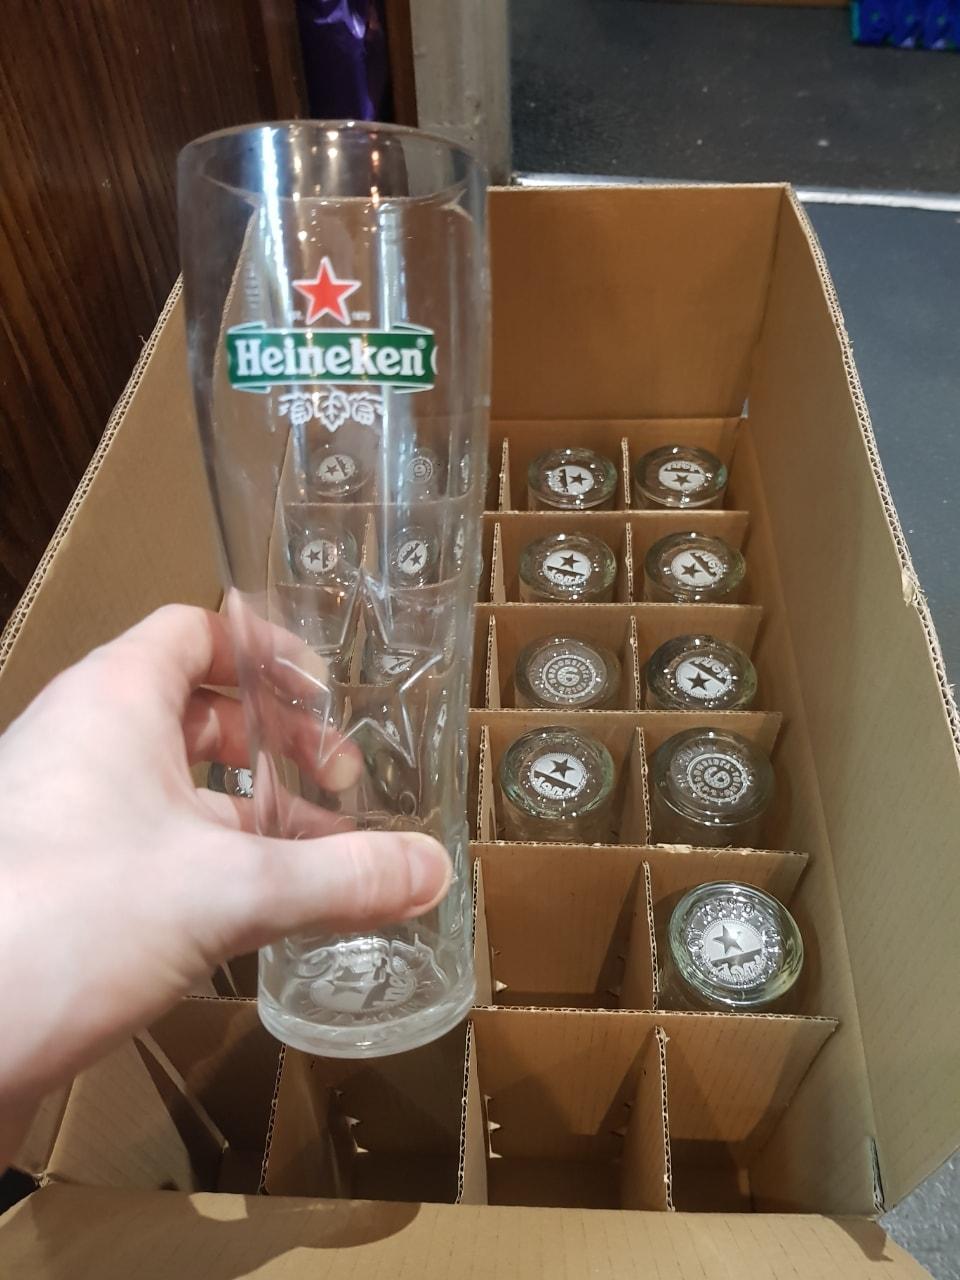 18 x Heineken Pint Glasses